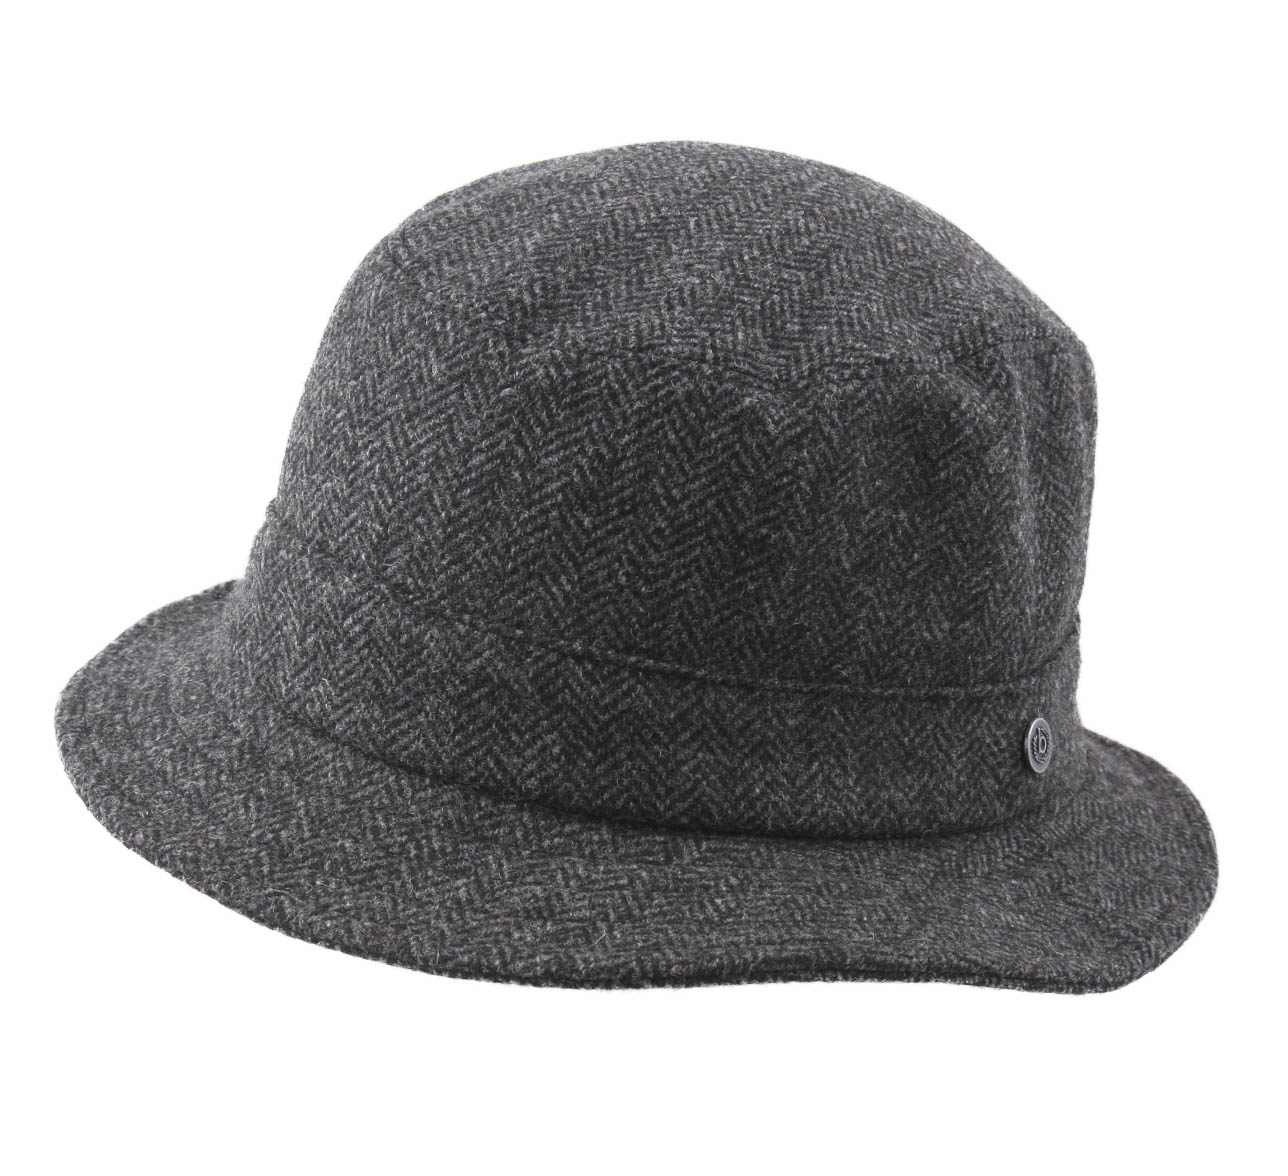 5db166331c0 Longoya - Hats Bugatti